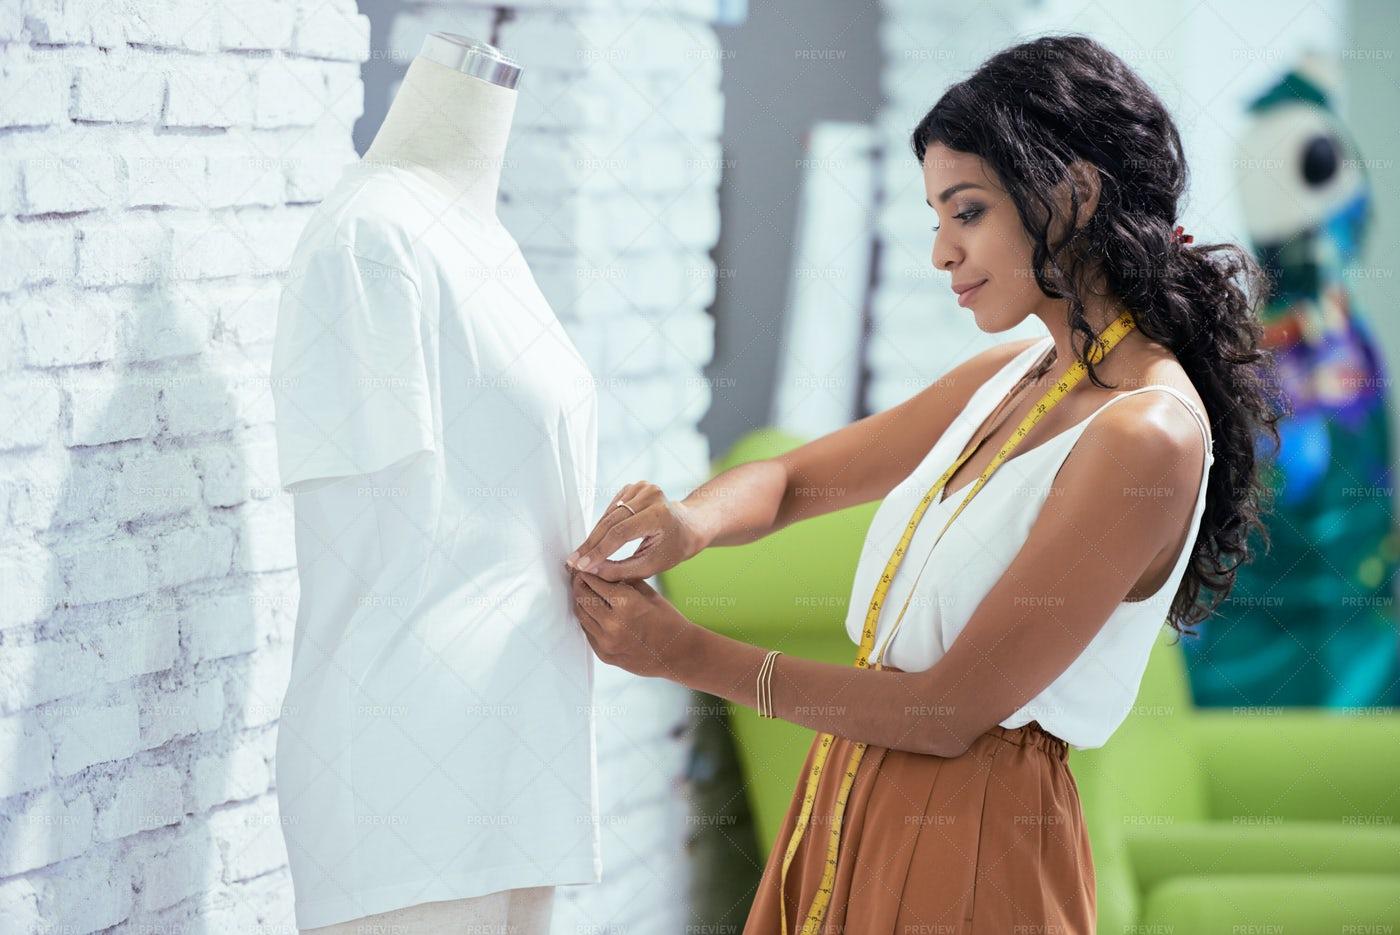 Tailor Pinning T-shirt On Mannequin: Stock Photos